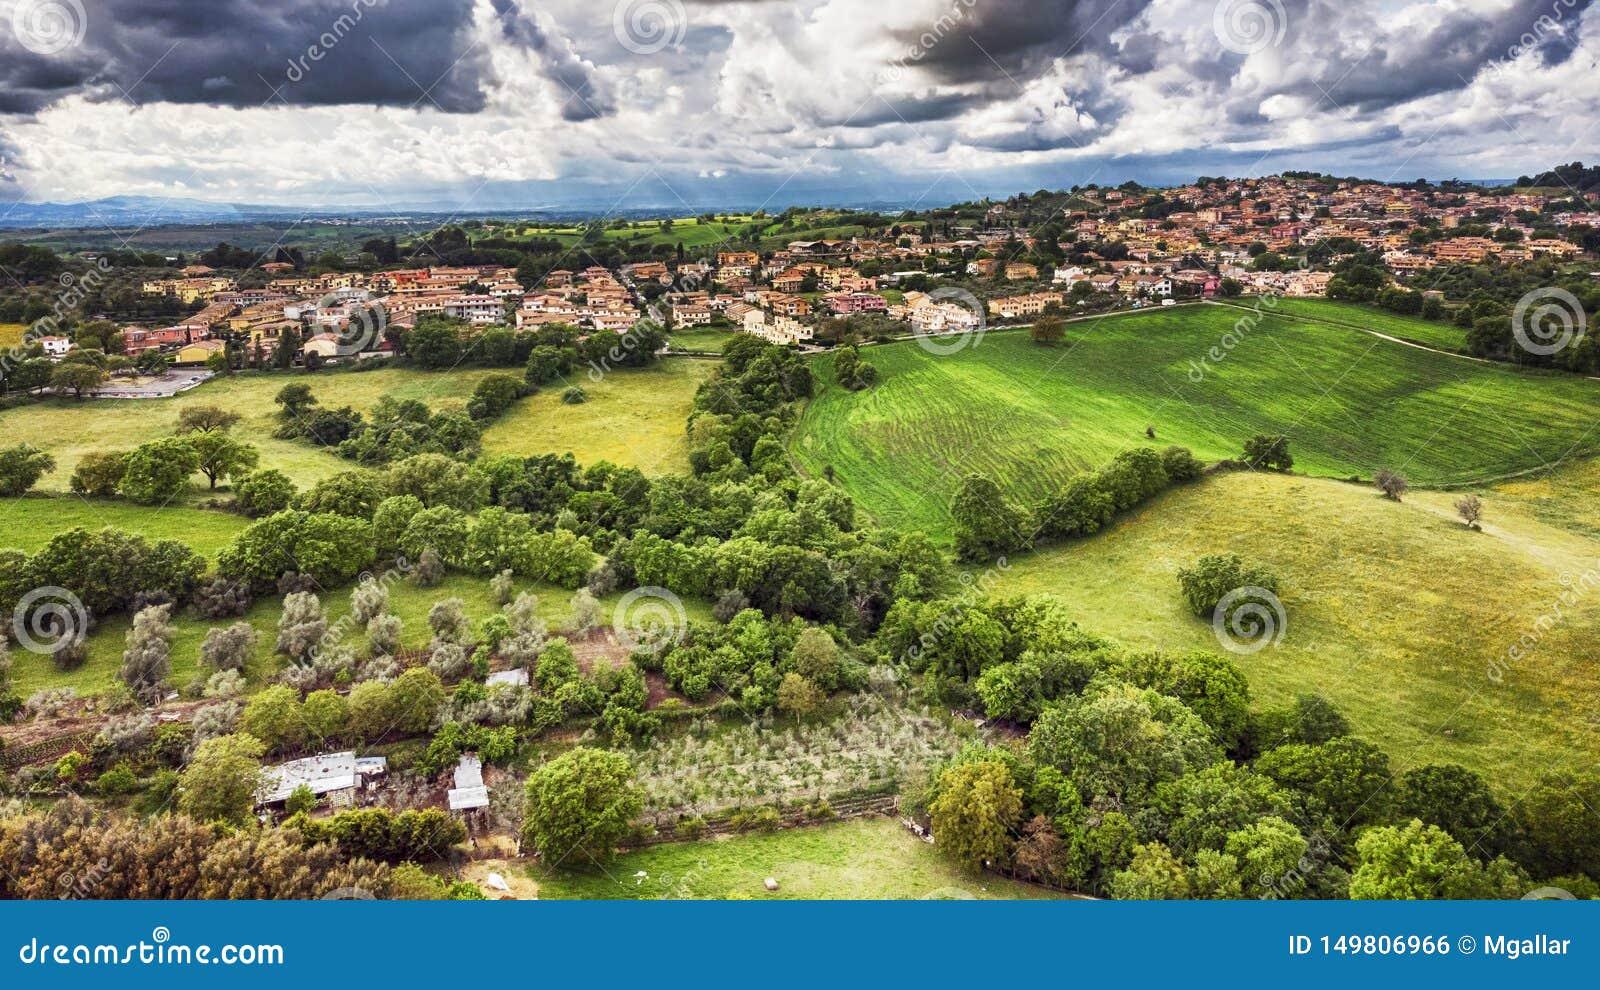 Showroom It Rignano Flaminio awe aerial view from green hills of rignano flaminio village